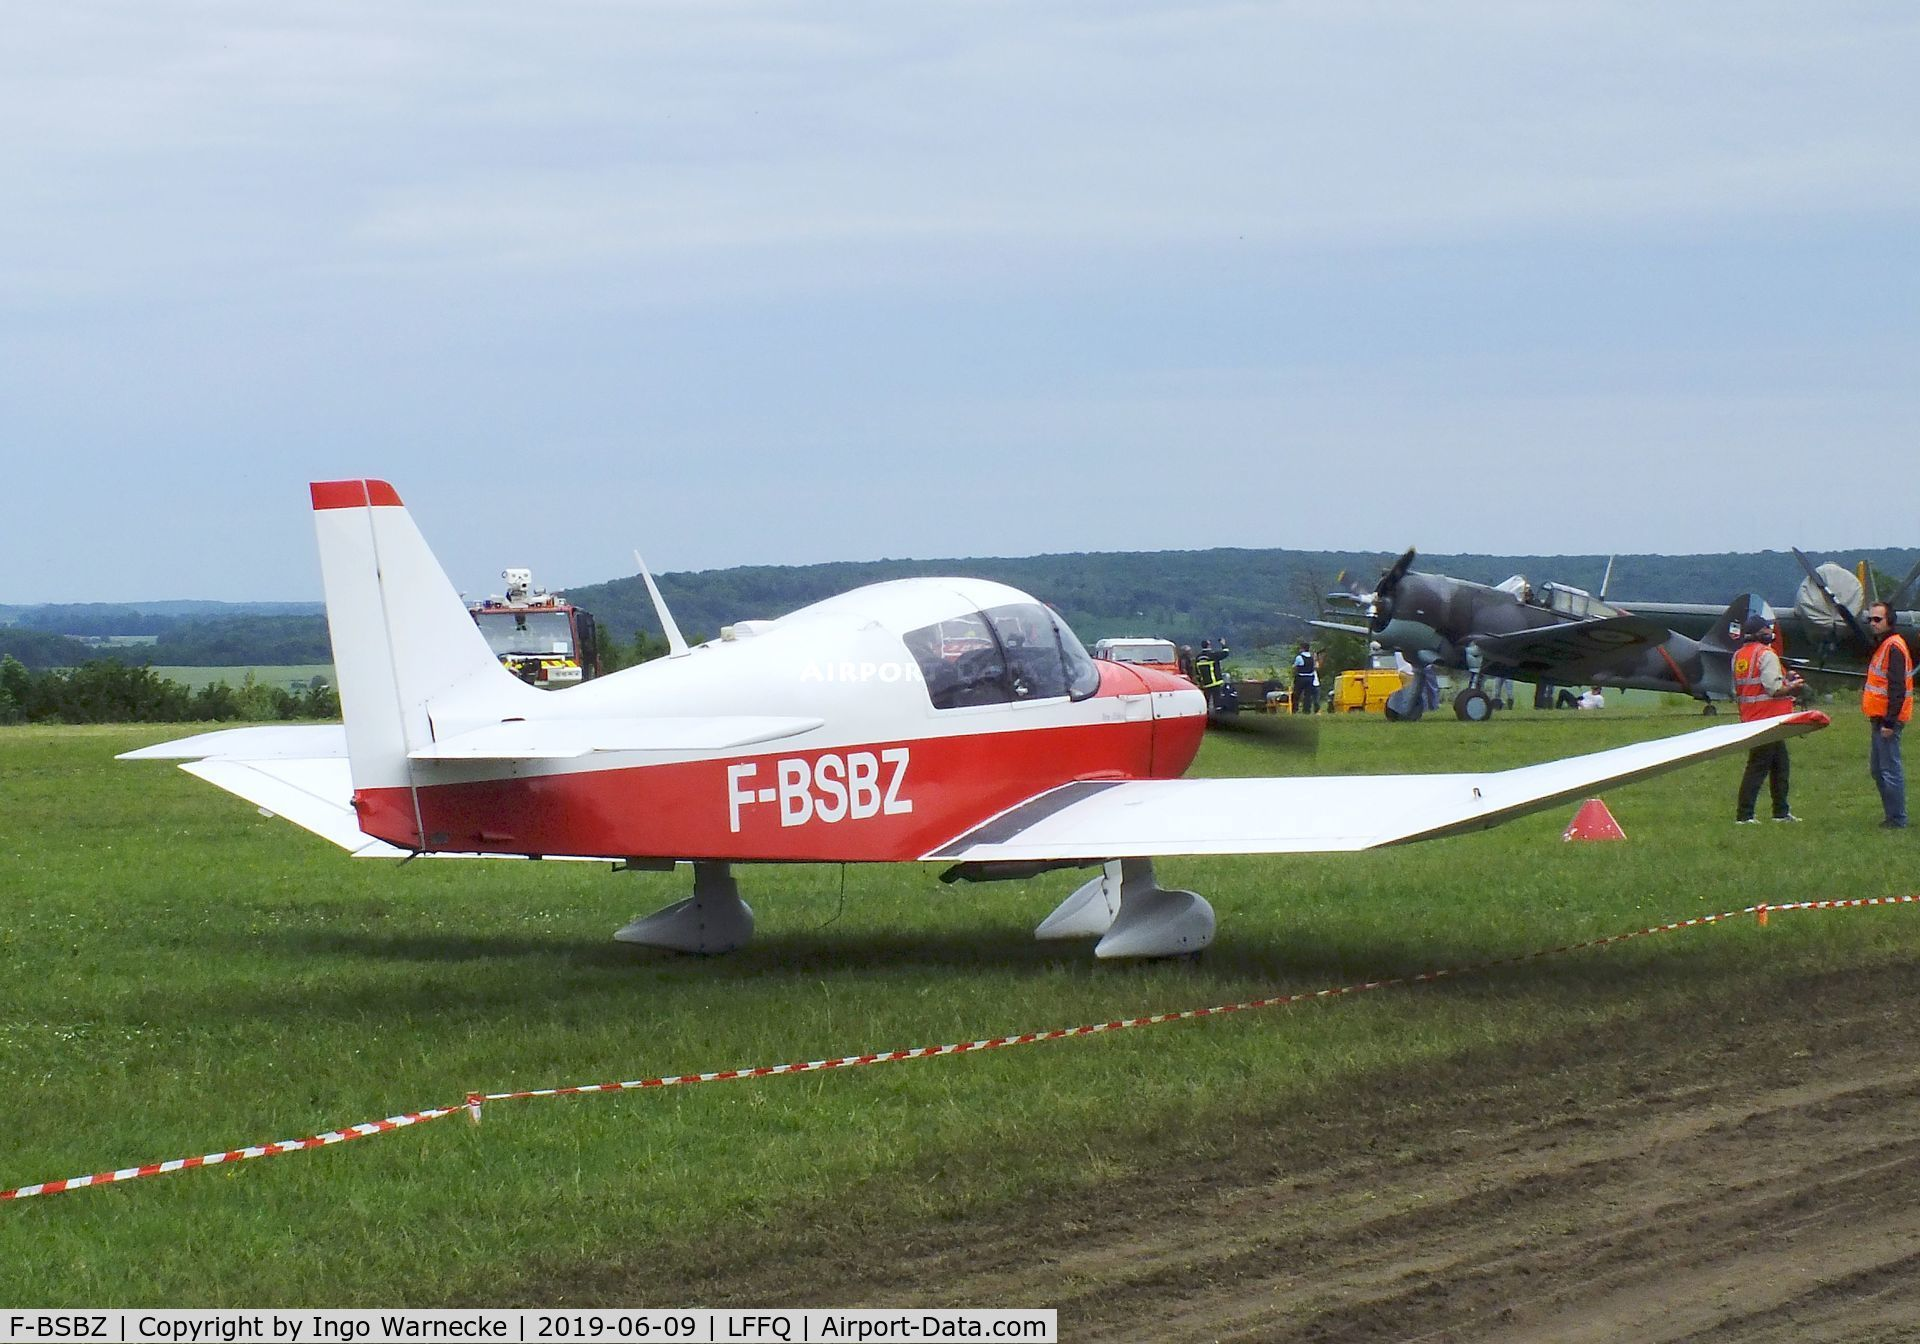 F-BSBZ, CEA DR-360 Chevalier C/N 482, CEA Robin DR.360 Chevalier at the Meeting Aerien 2019, La-Ferte-Alais